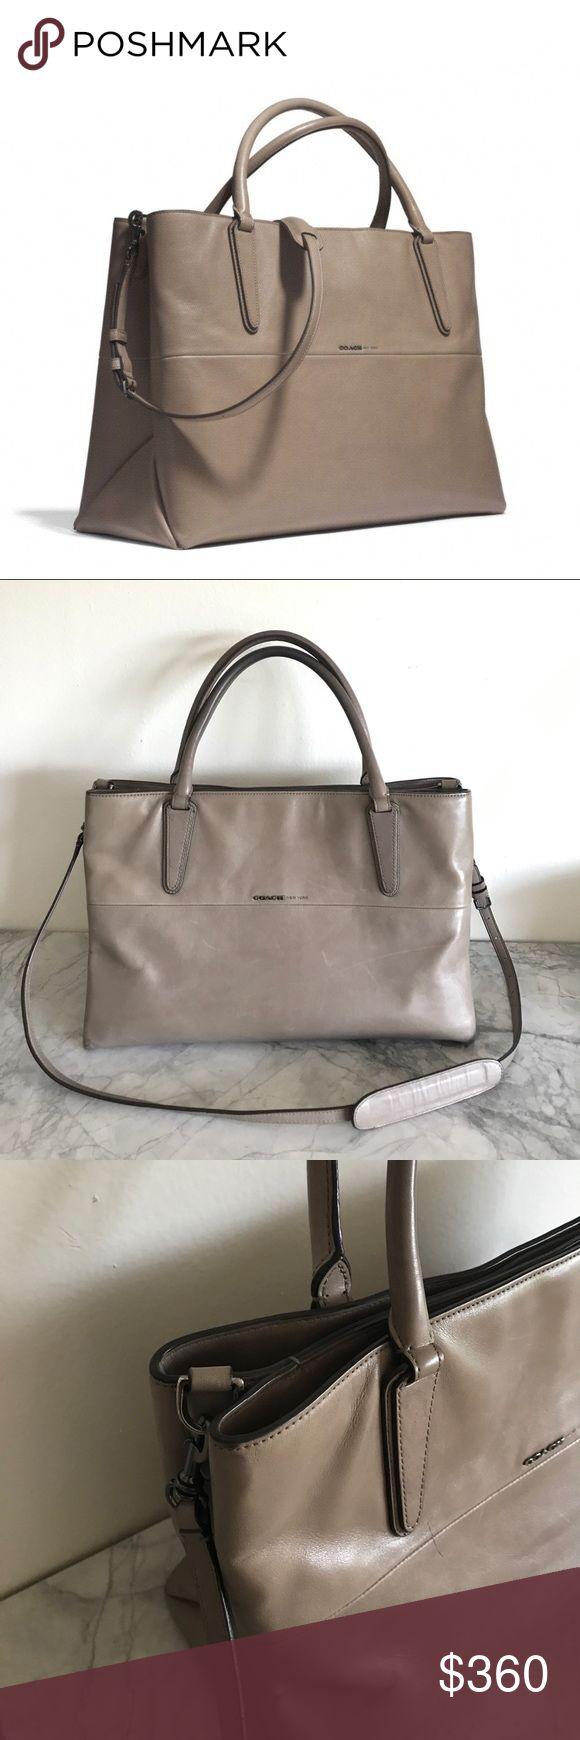 "Coach- Borough bag Soft leather. Size: 13.75""x9""x5.5"" Elegant and clean design. Minor wear, excellent condition. Comes with original dust bag. Coach Bags"